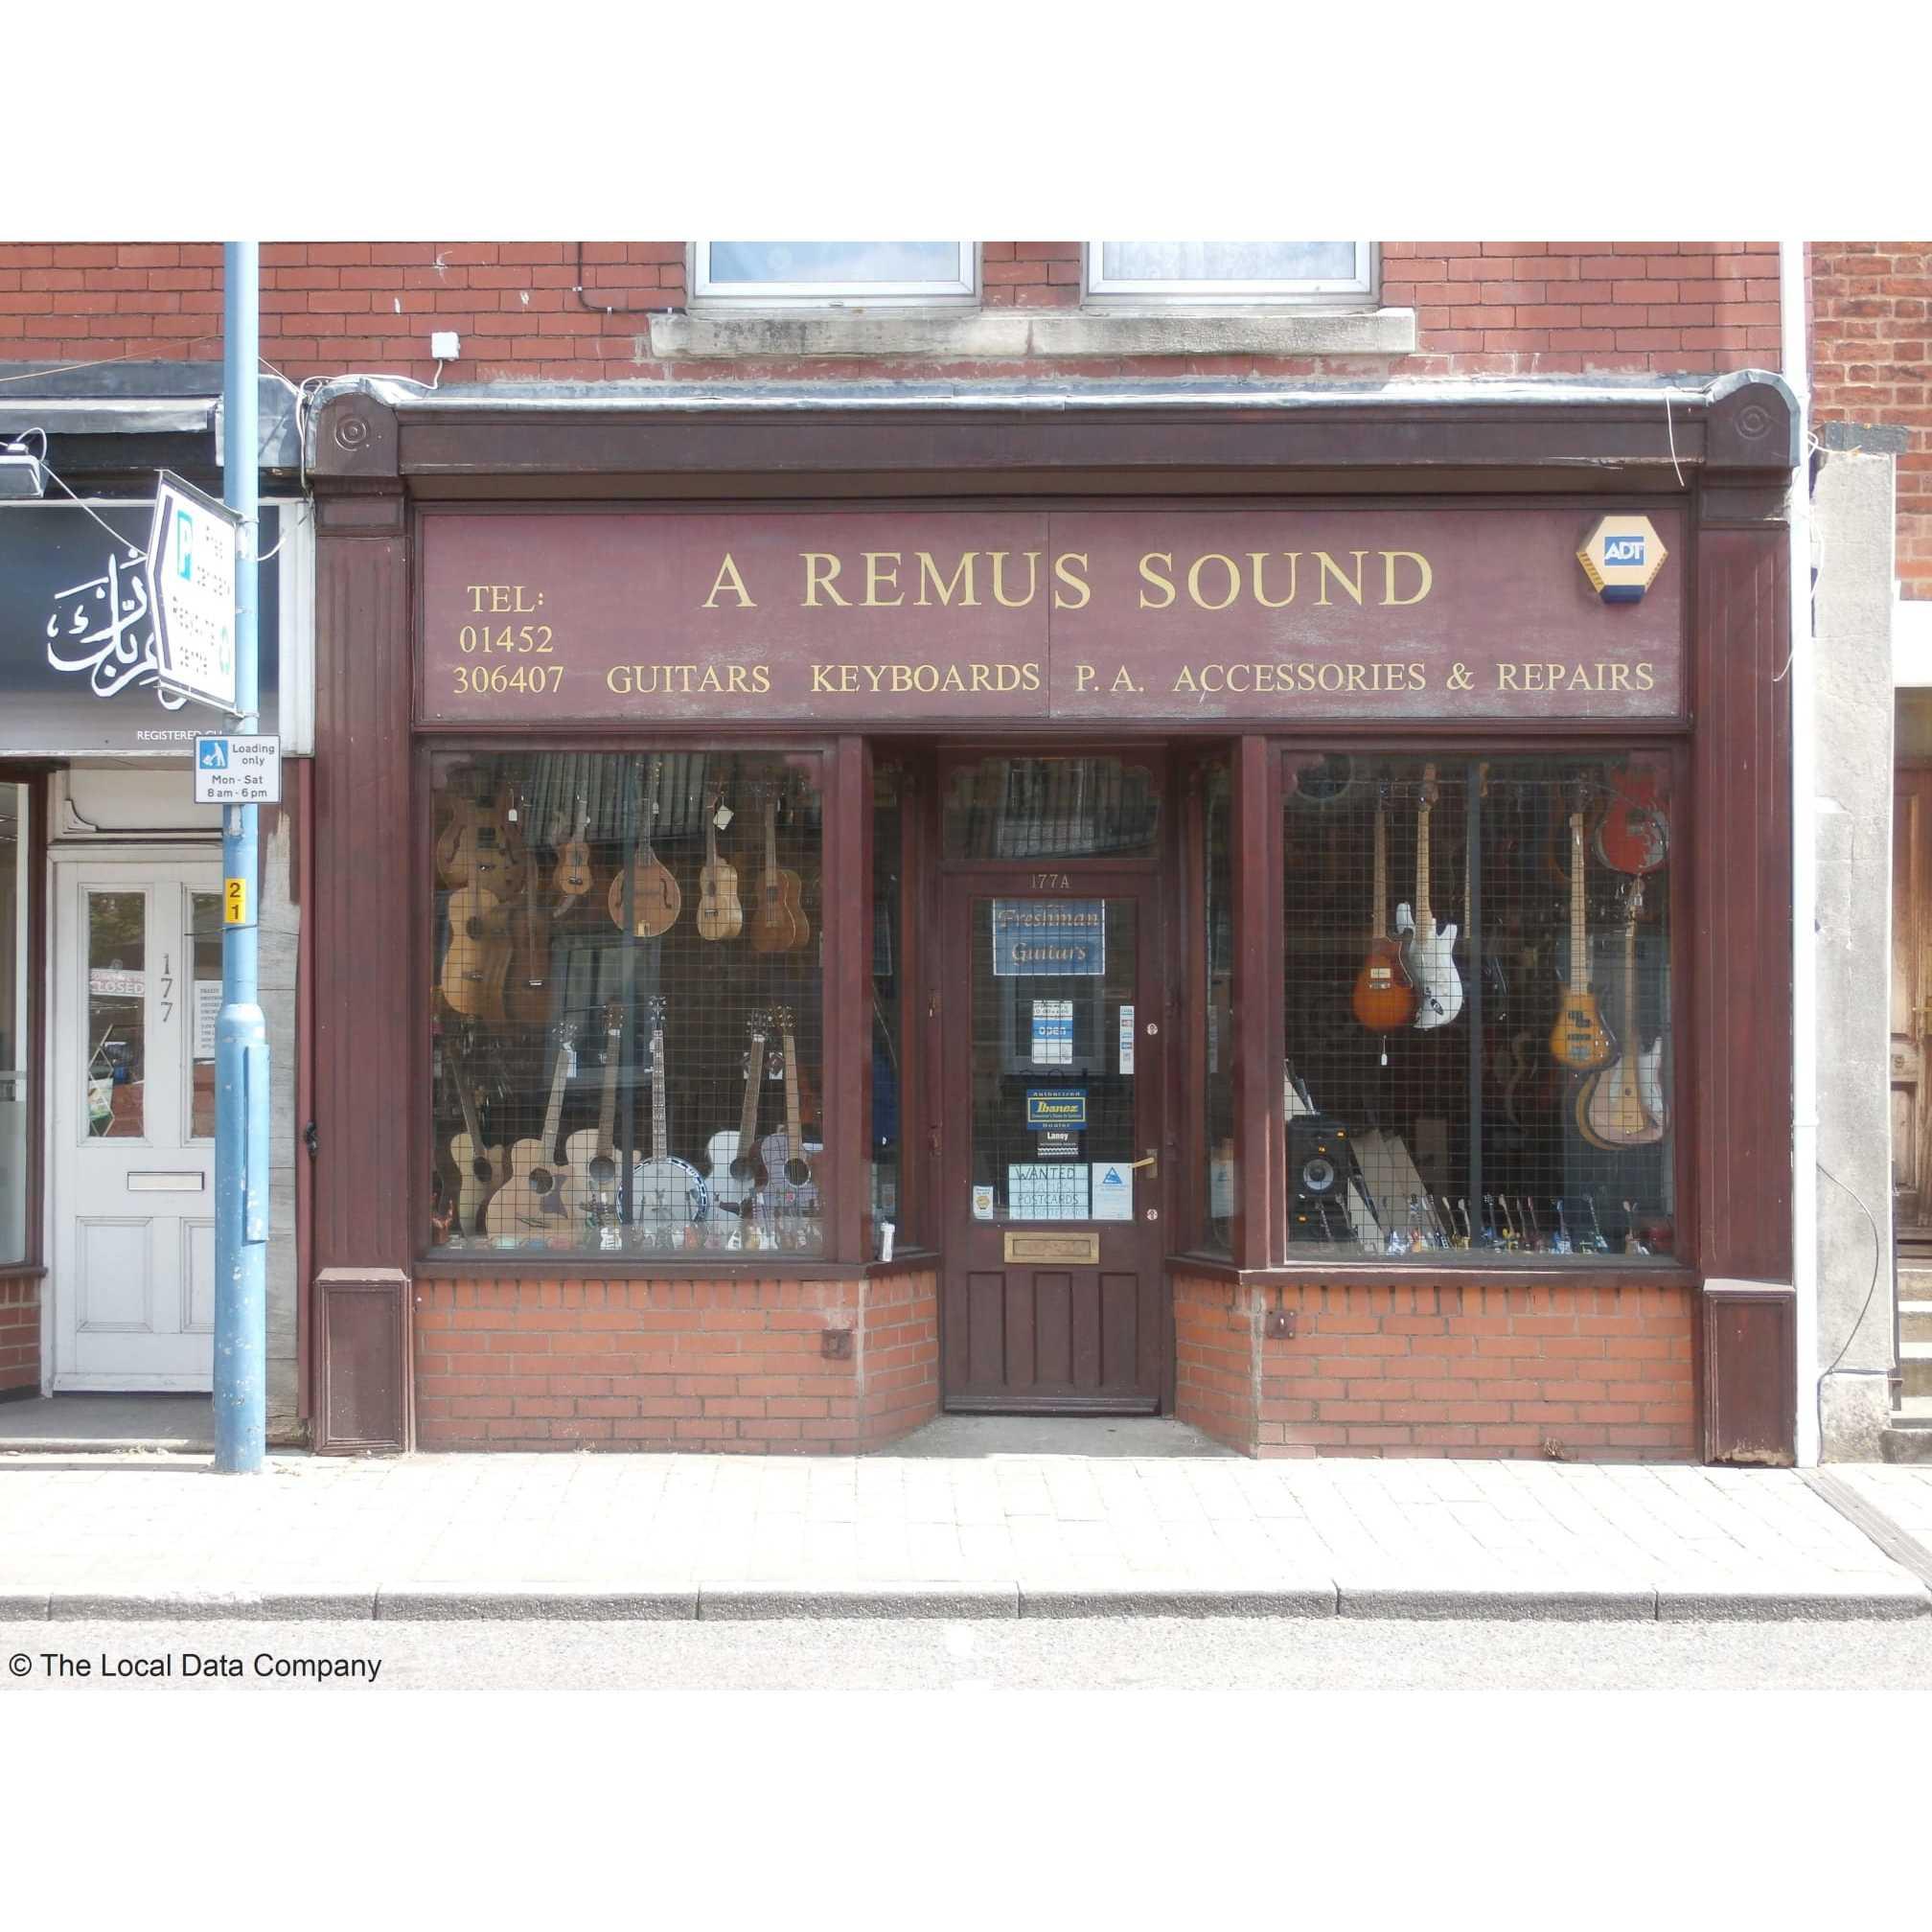 A Remus Sound - Gloucester, Gloucestershire GL1 4EZ - 01452 306407   ShowMeLocal.com